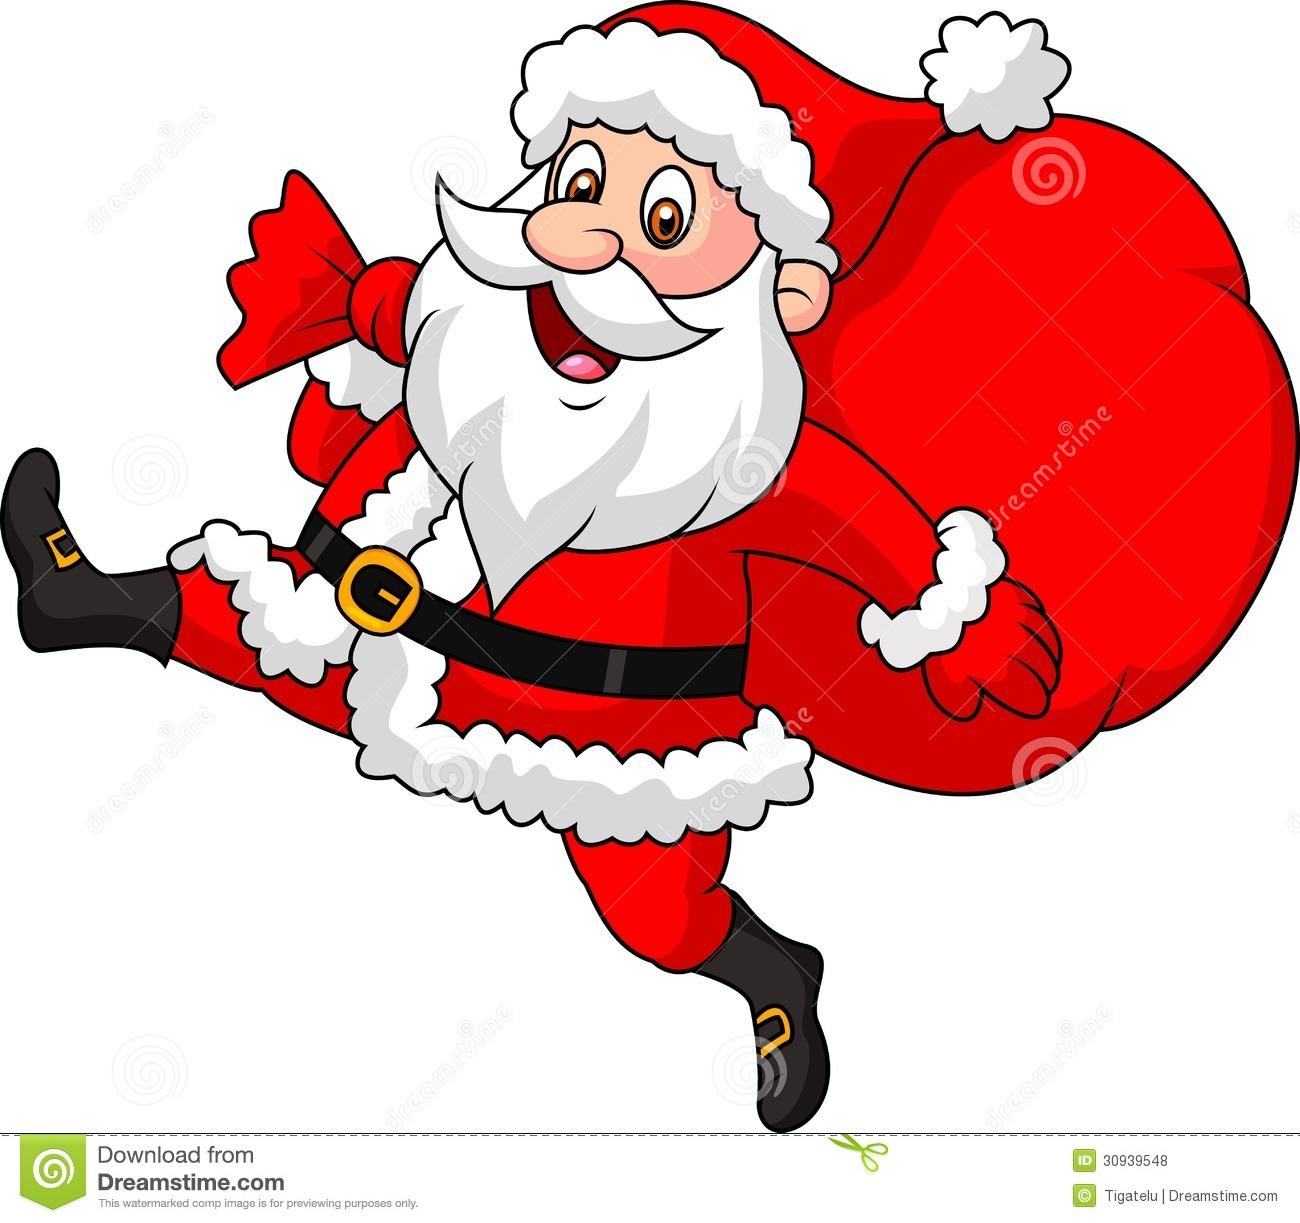 Santa Claus Clipart Animated.